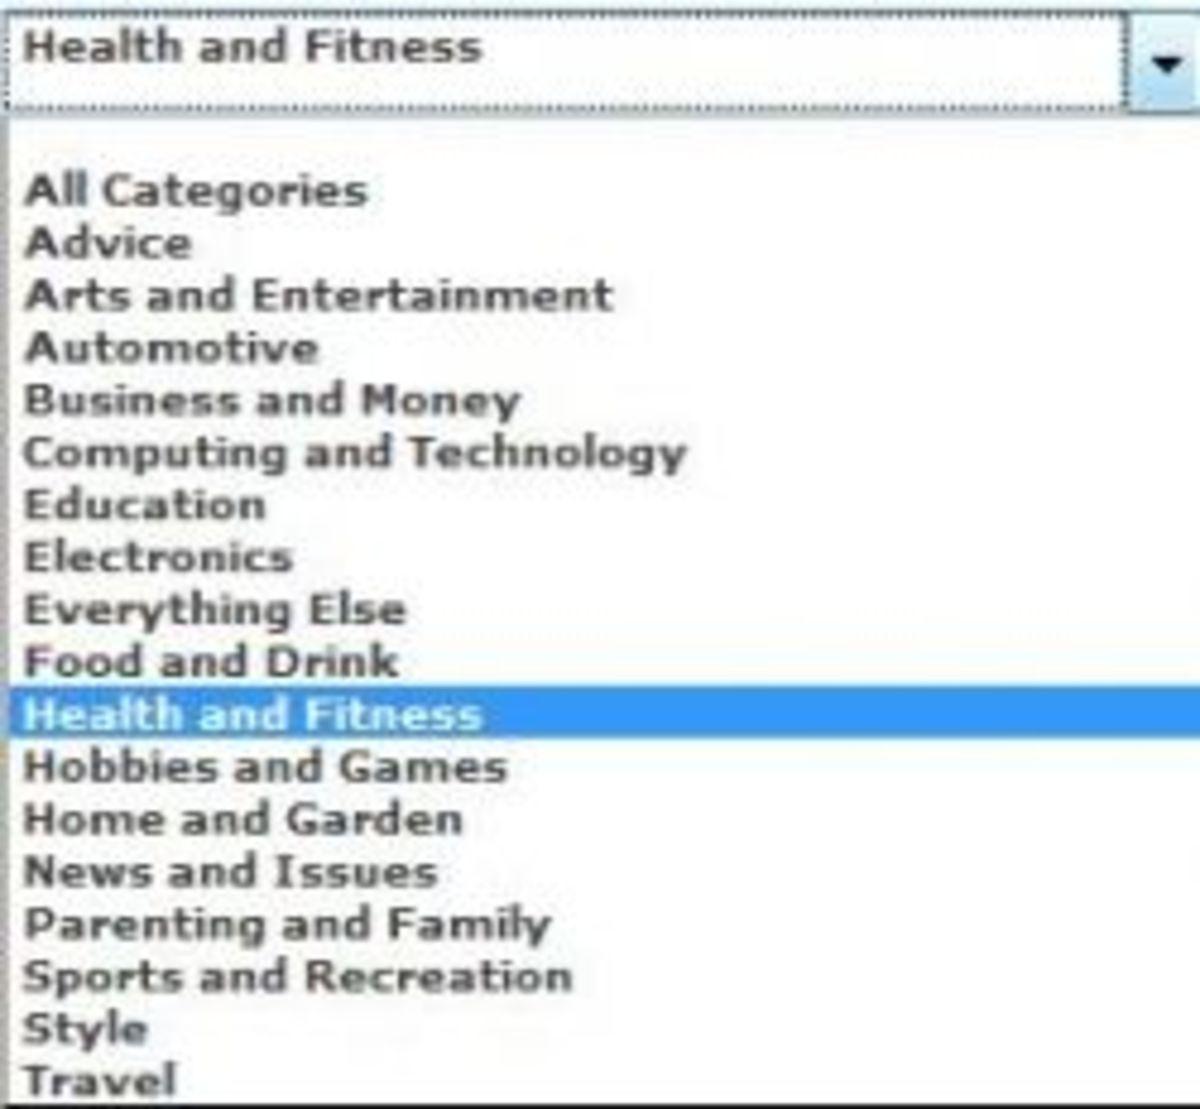 Weegy categories